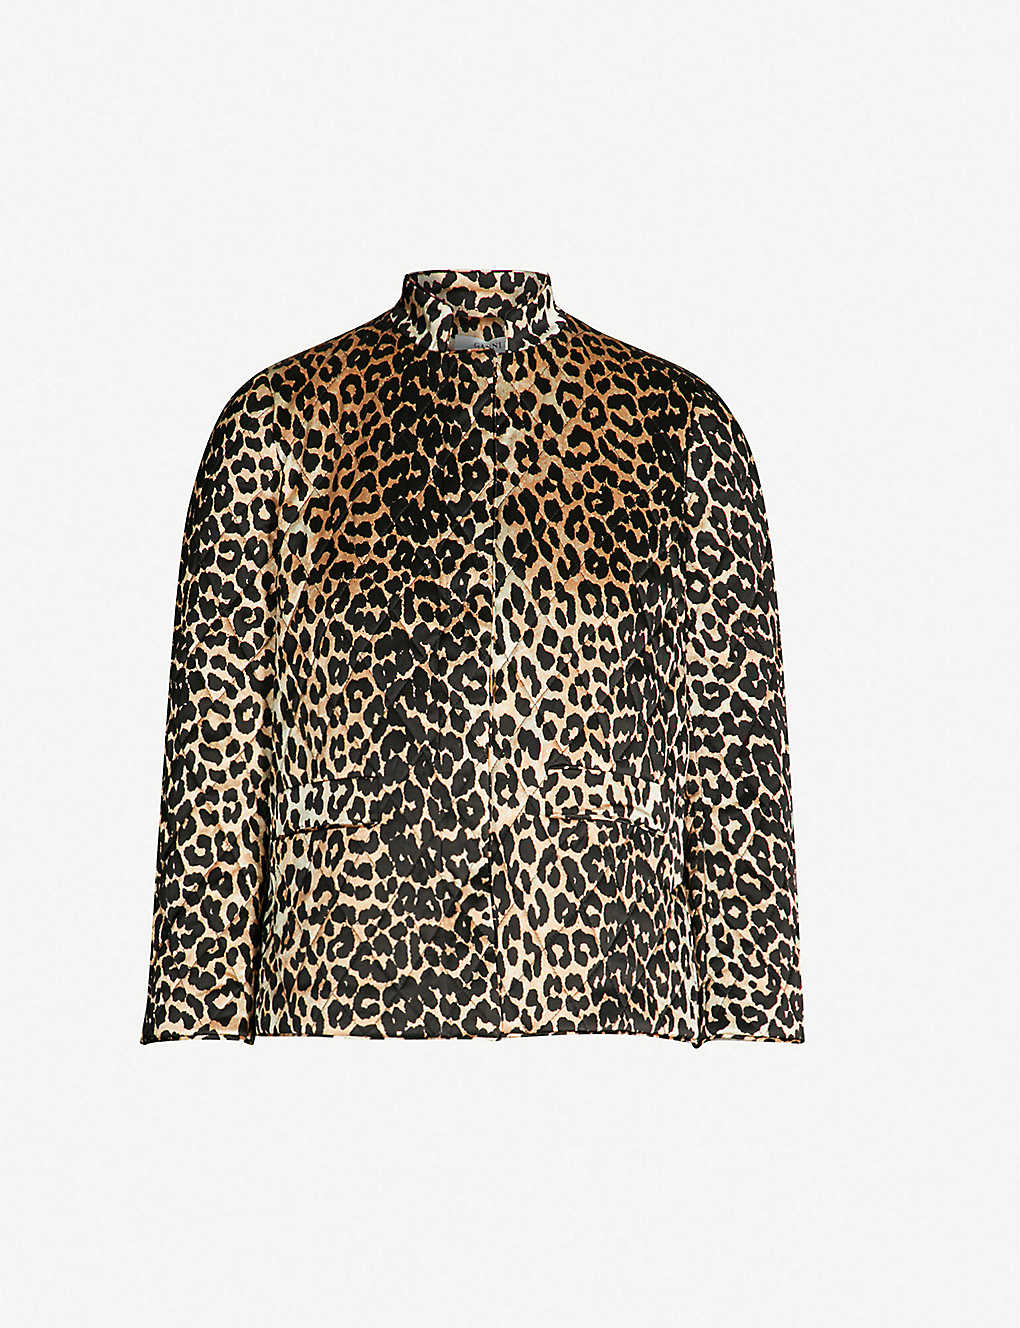 d8d425e7 Ganni jakke leopard